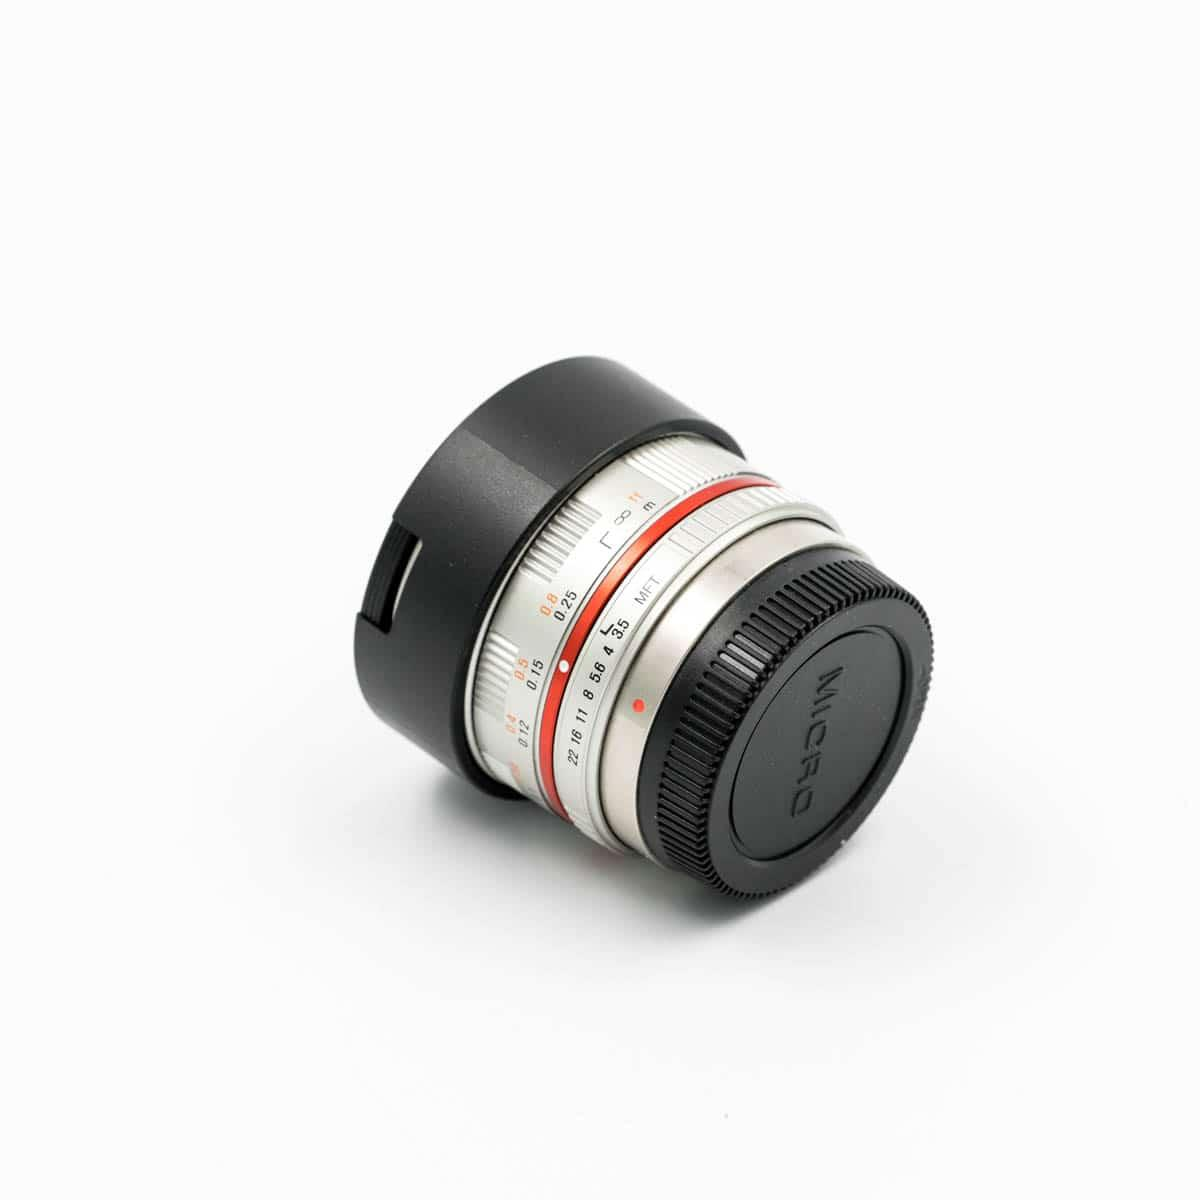 samyang 7.5mm 3.5 olympus